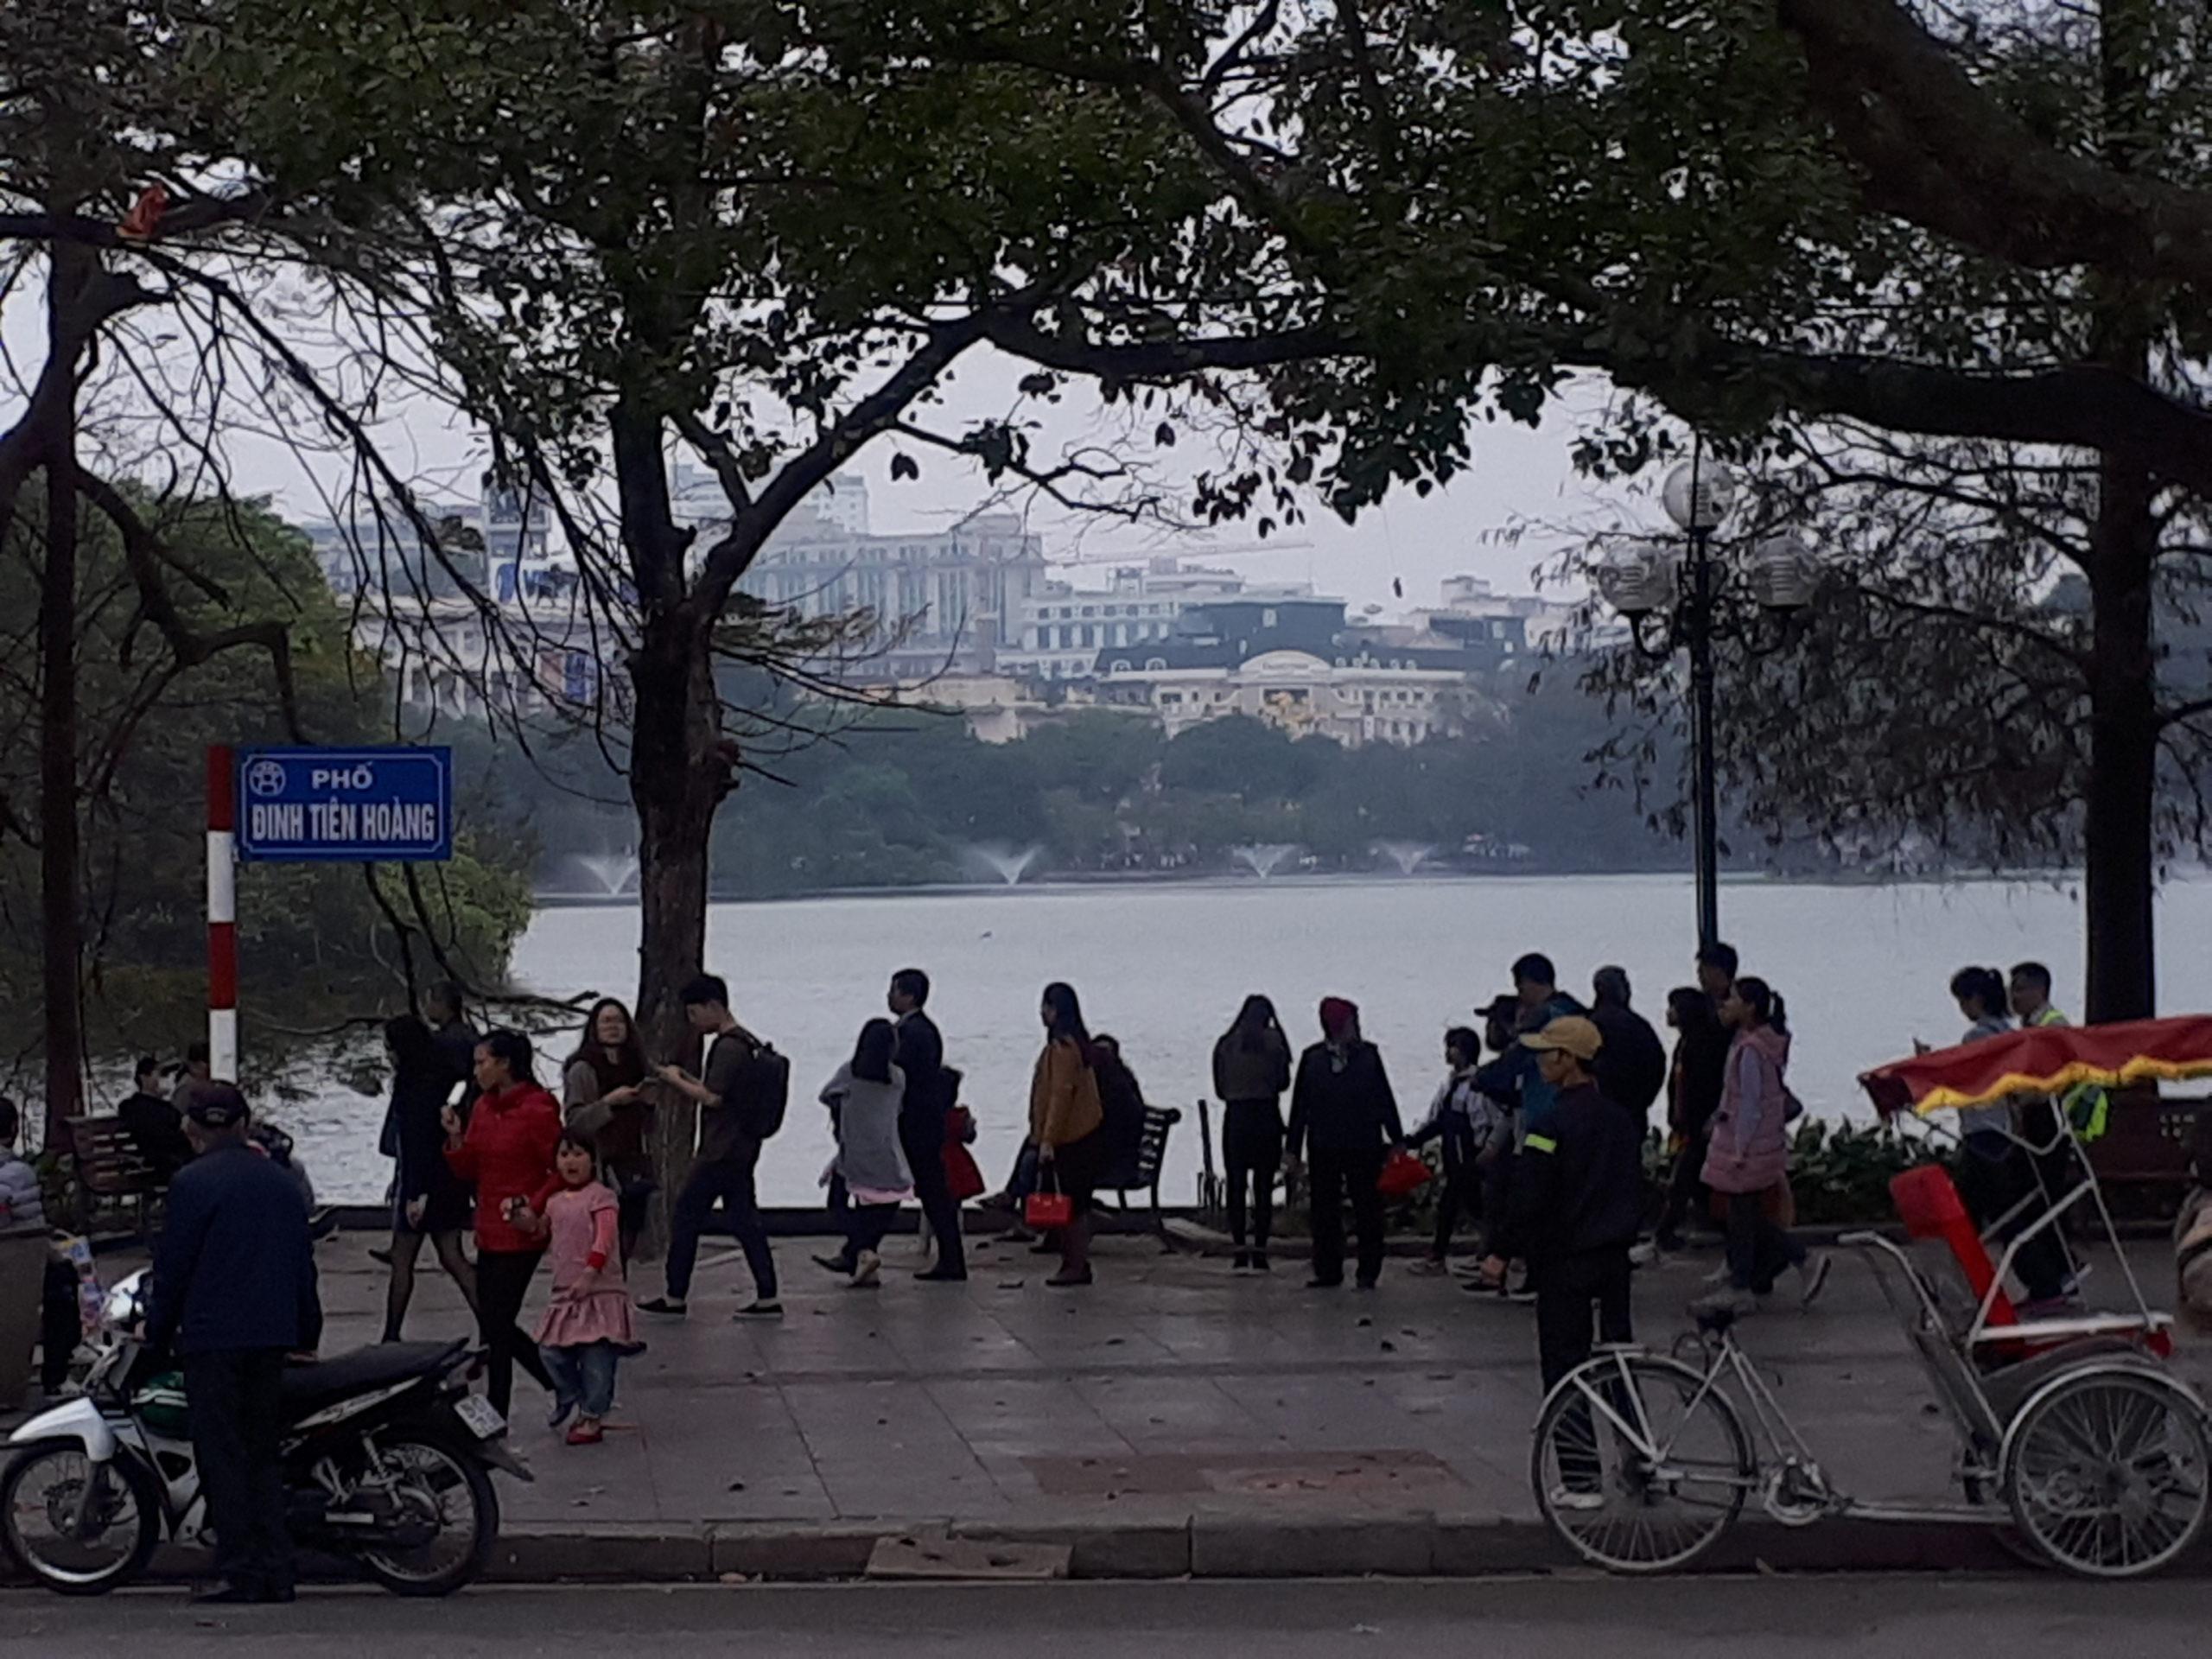 The Caballos hotel in the heart of Hanoi